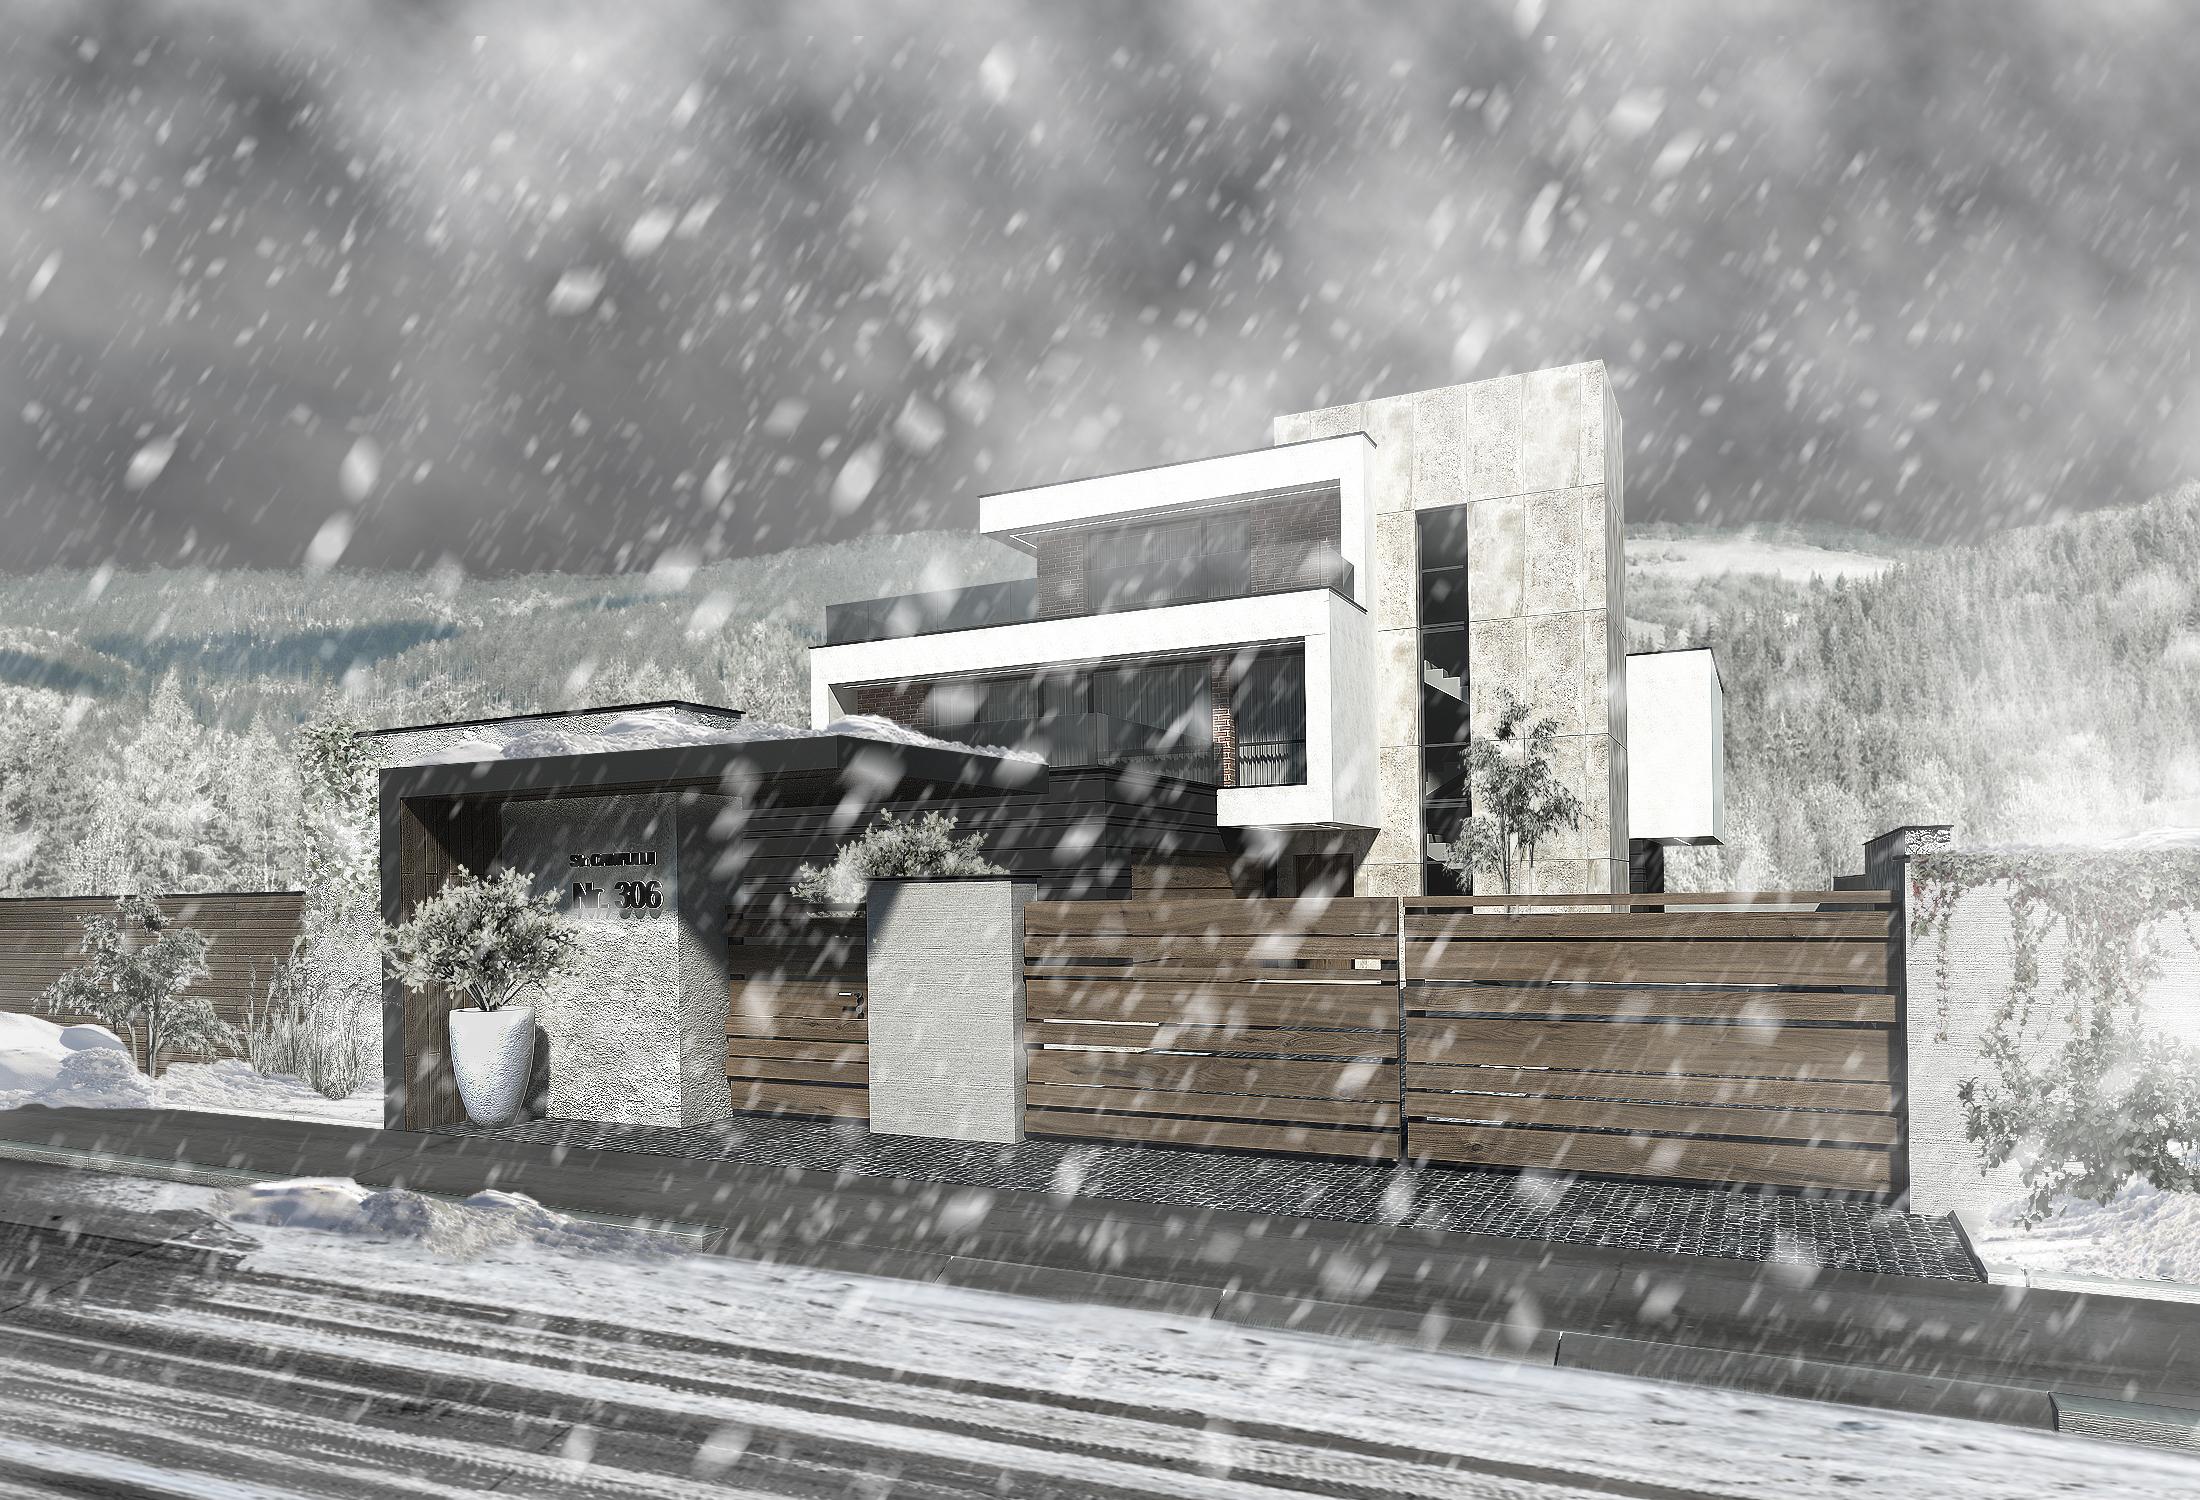 Casa_concept_2 - iarna3.jpg